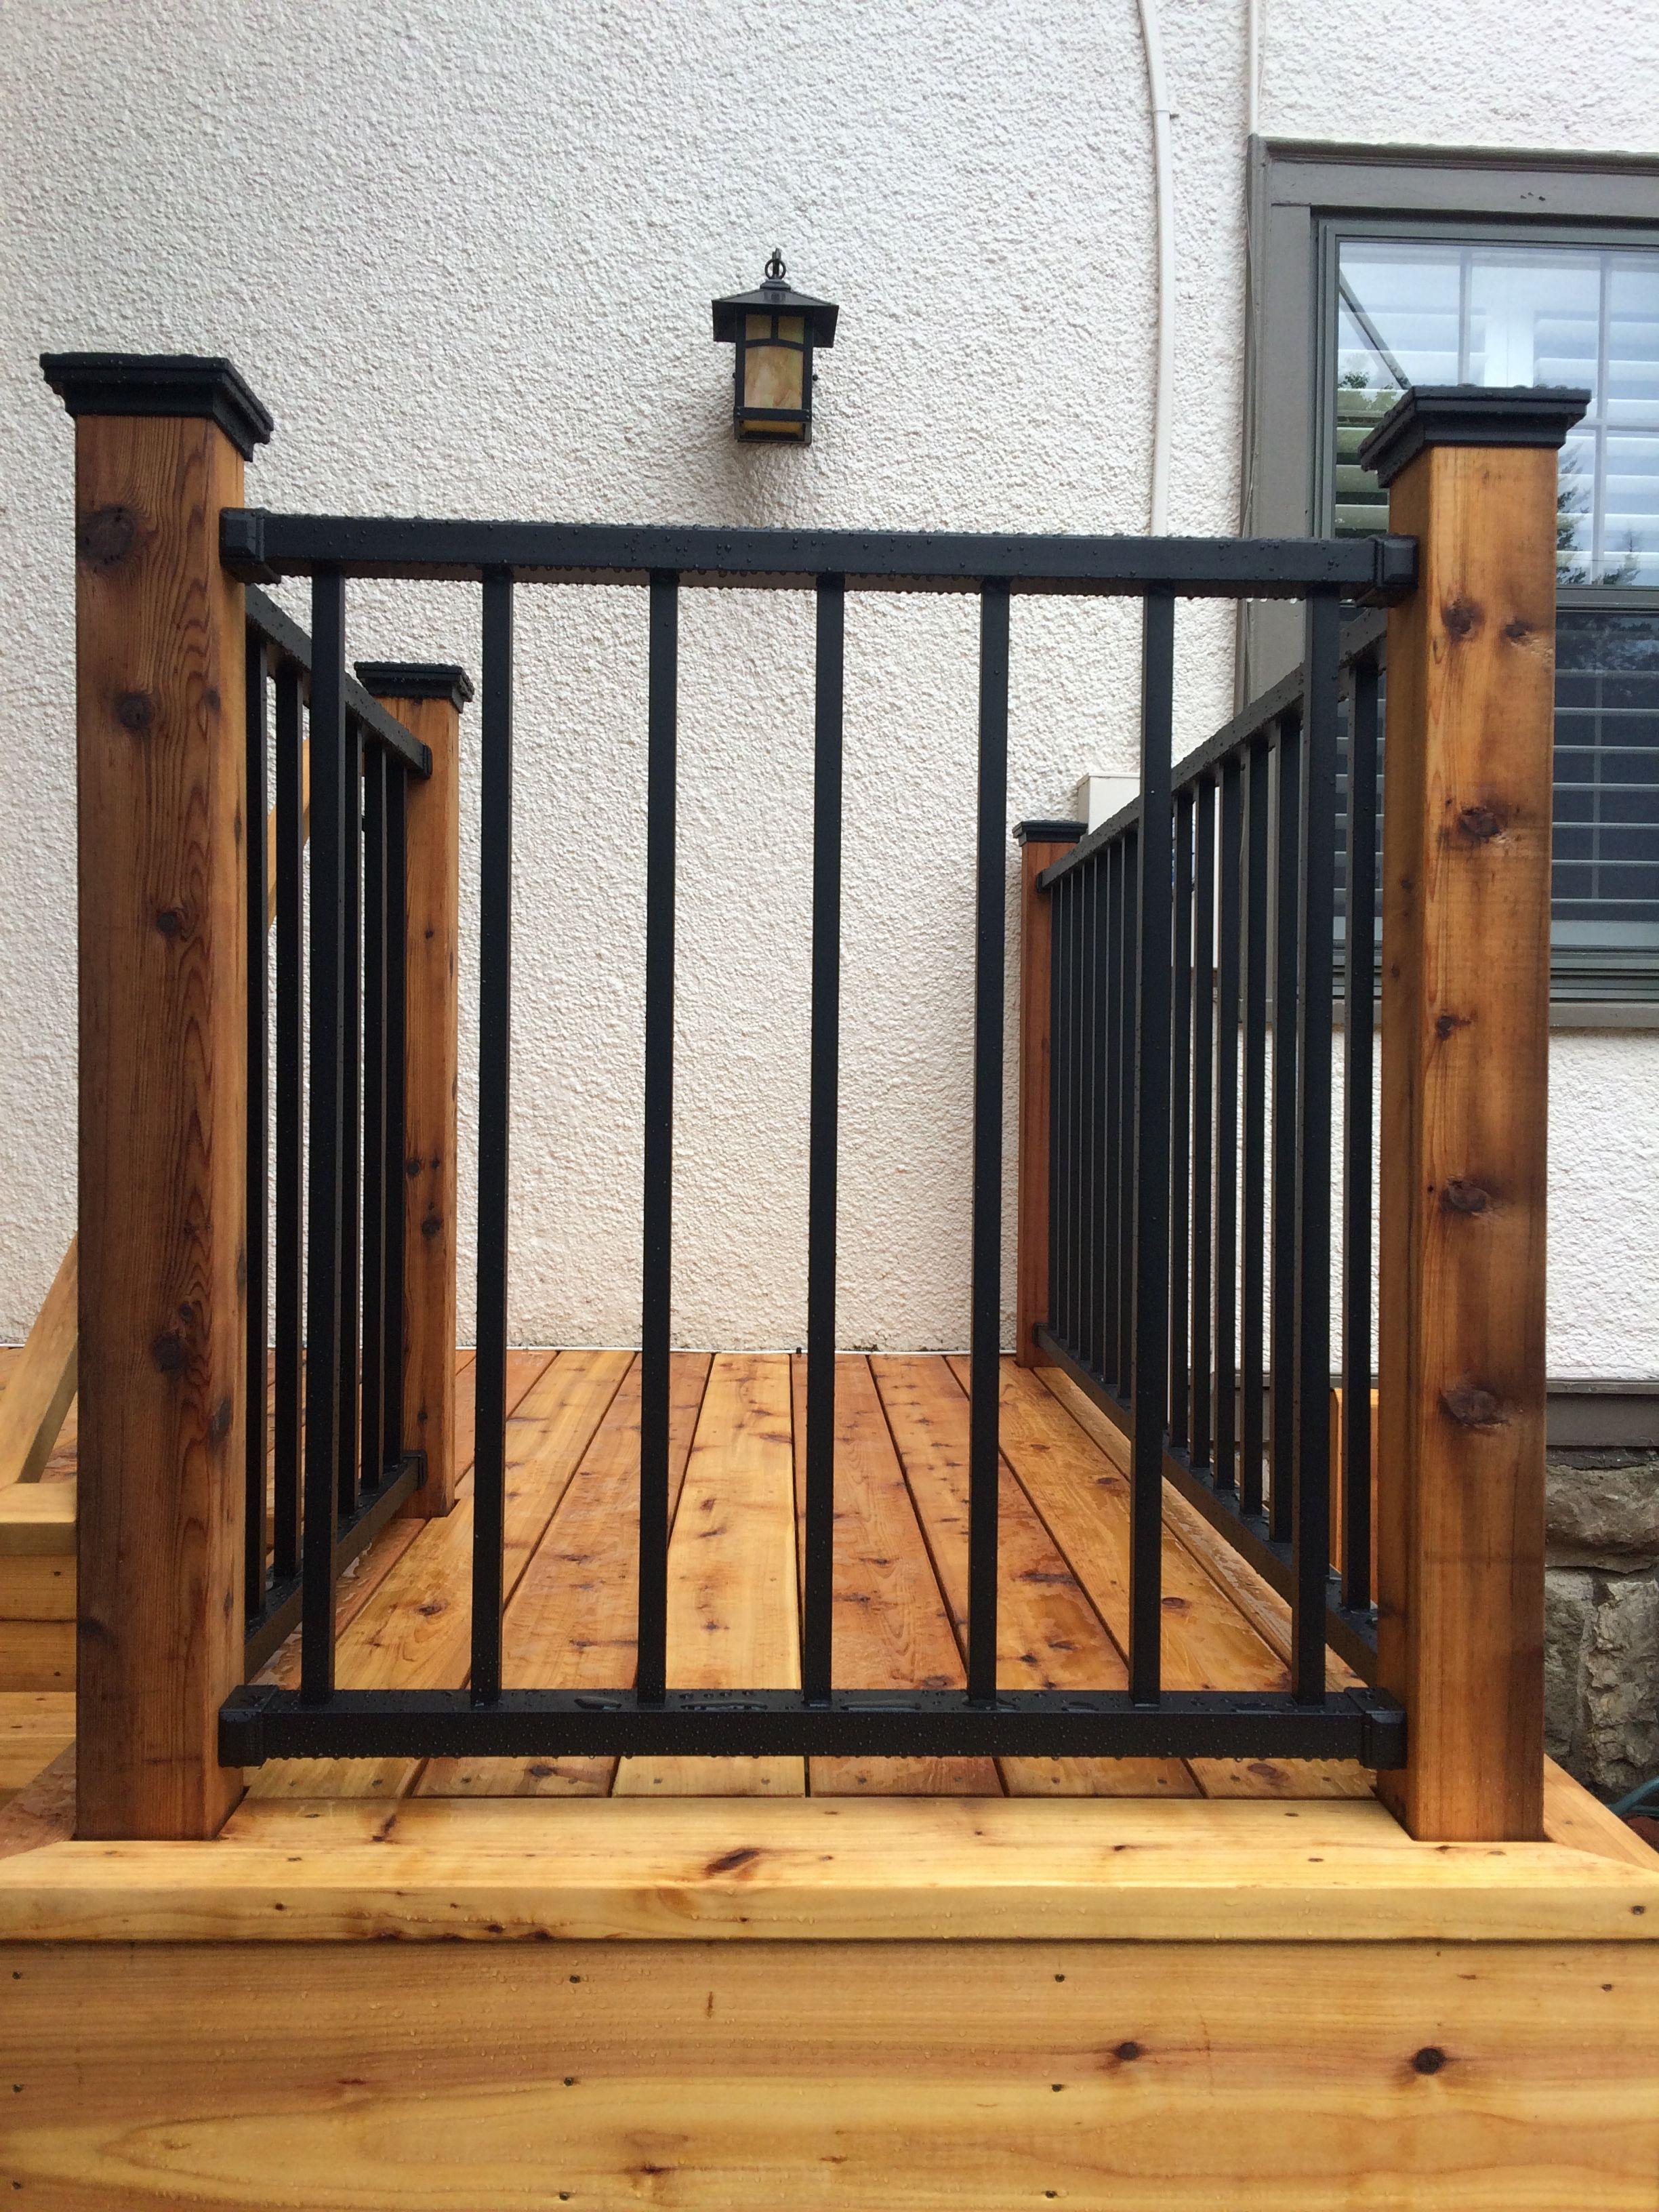 Westbury Aluminum Railing Black Attached To Cedar Posts | Home Depot Exterior Handrail | Wood | Wrought Iron | Deck | House | Interior